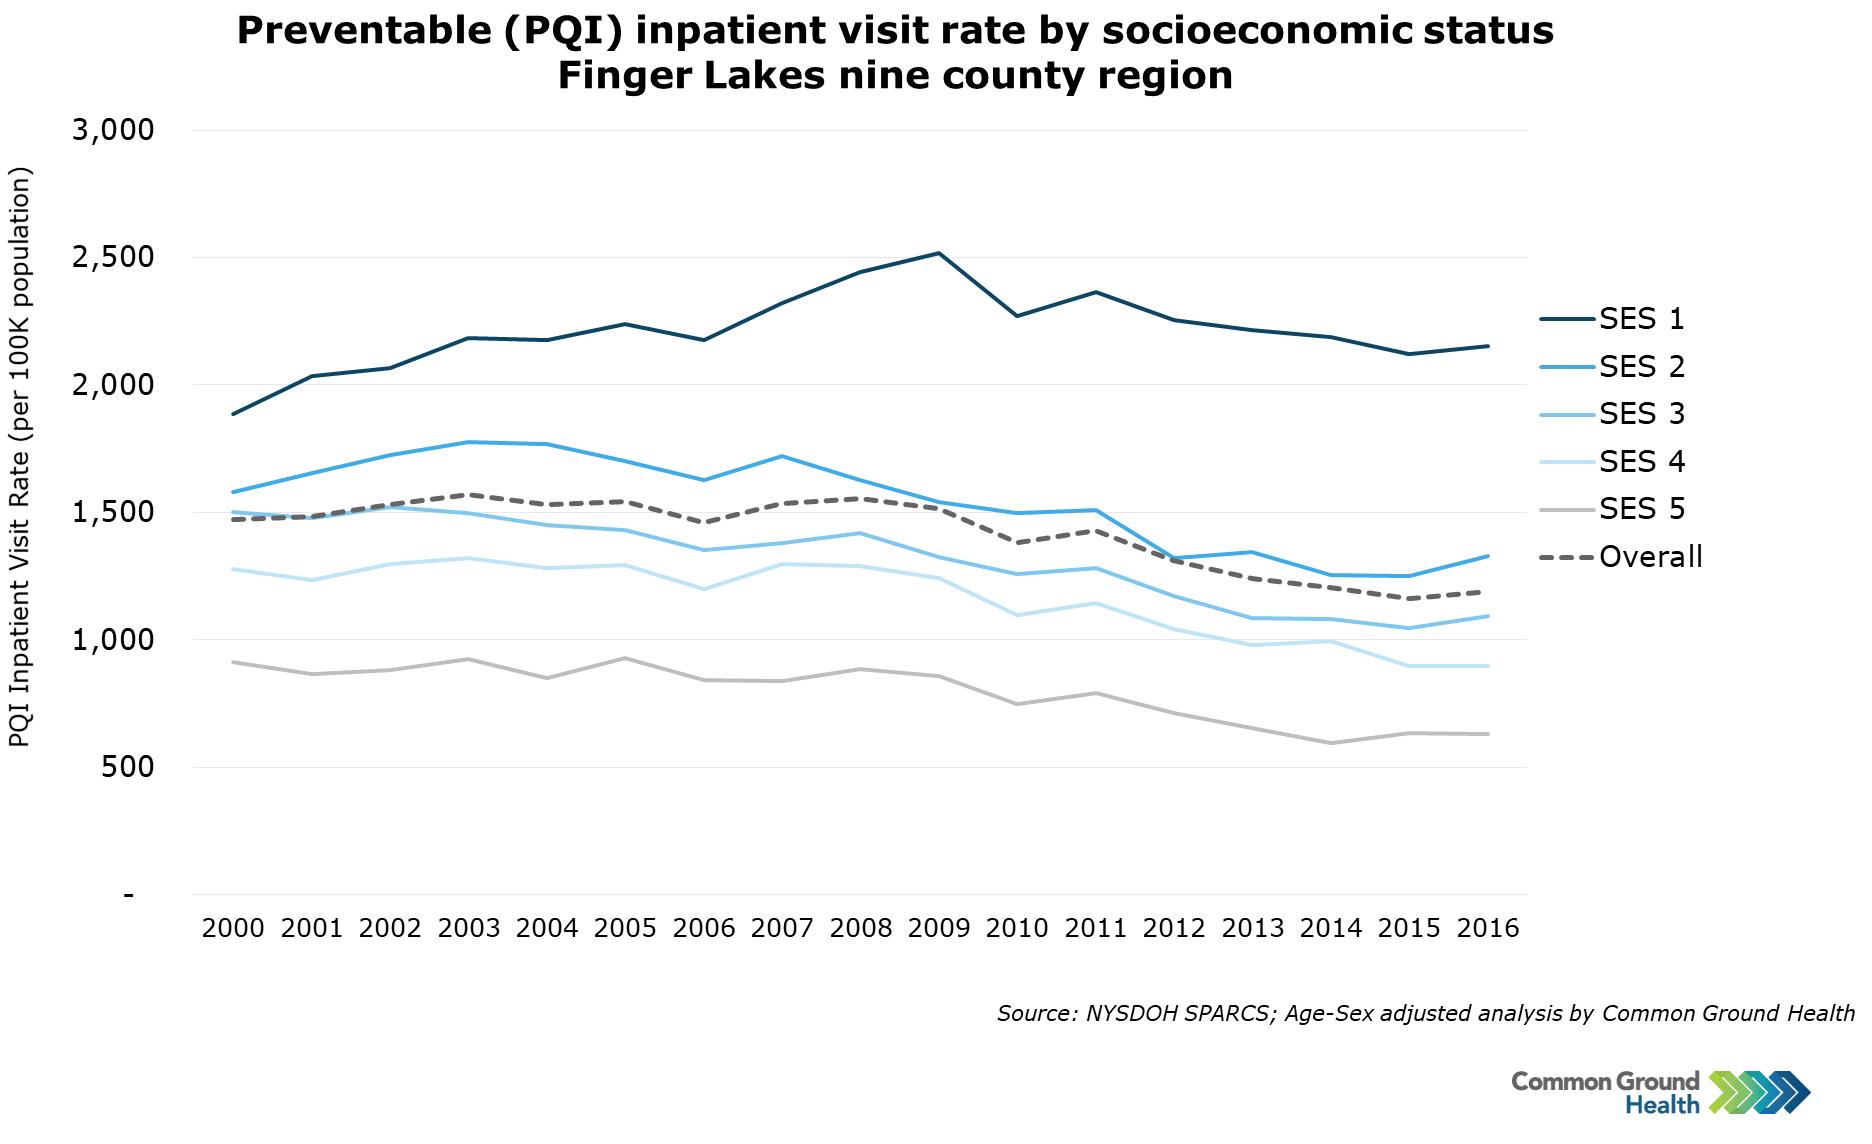 Preventable (PQI) Inpatient Visit Rates by Socioeconomic Status